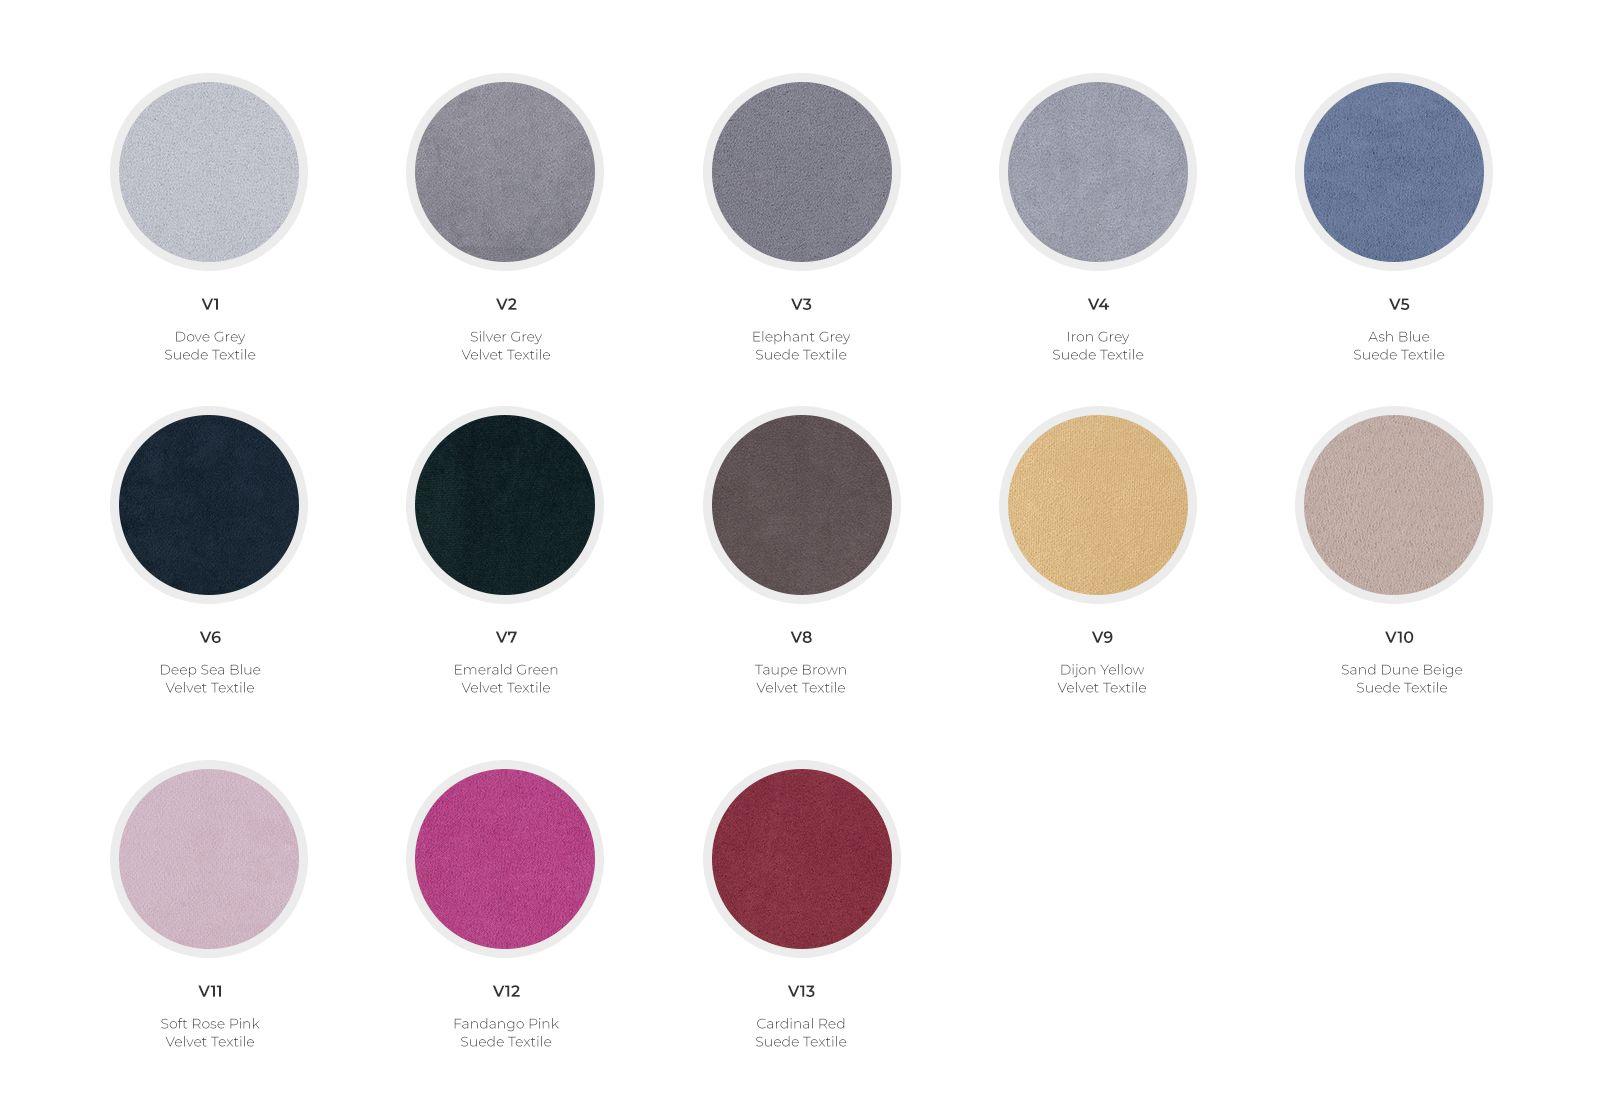 Velvet and Suede Textile Range